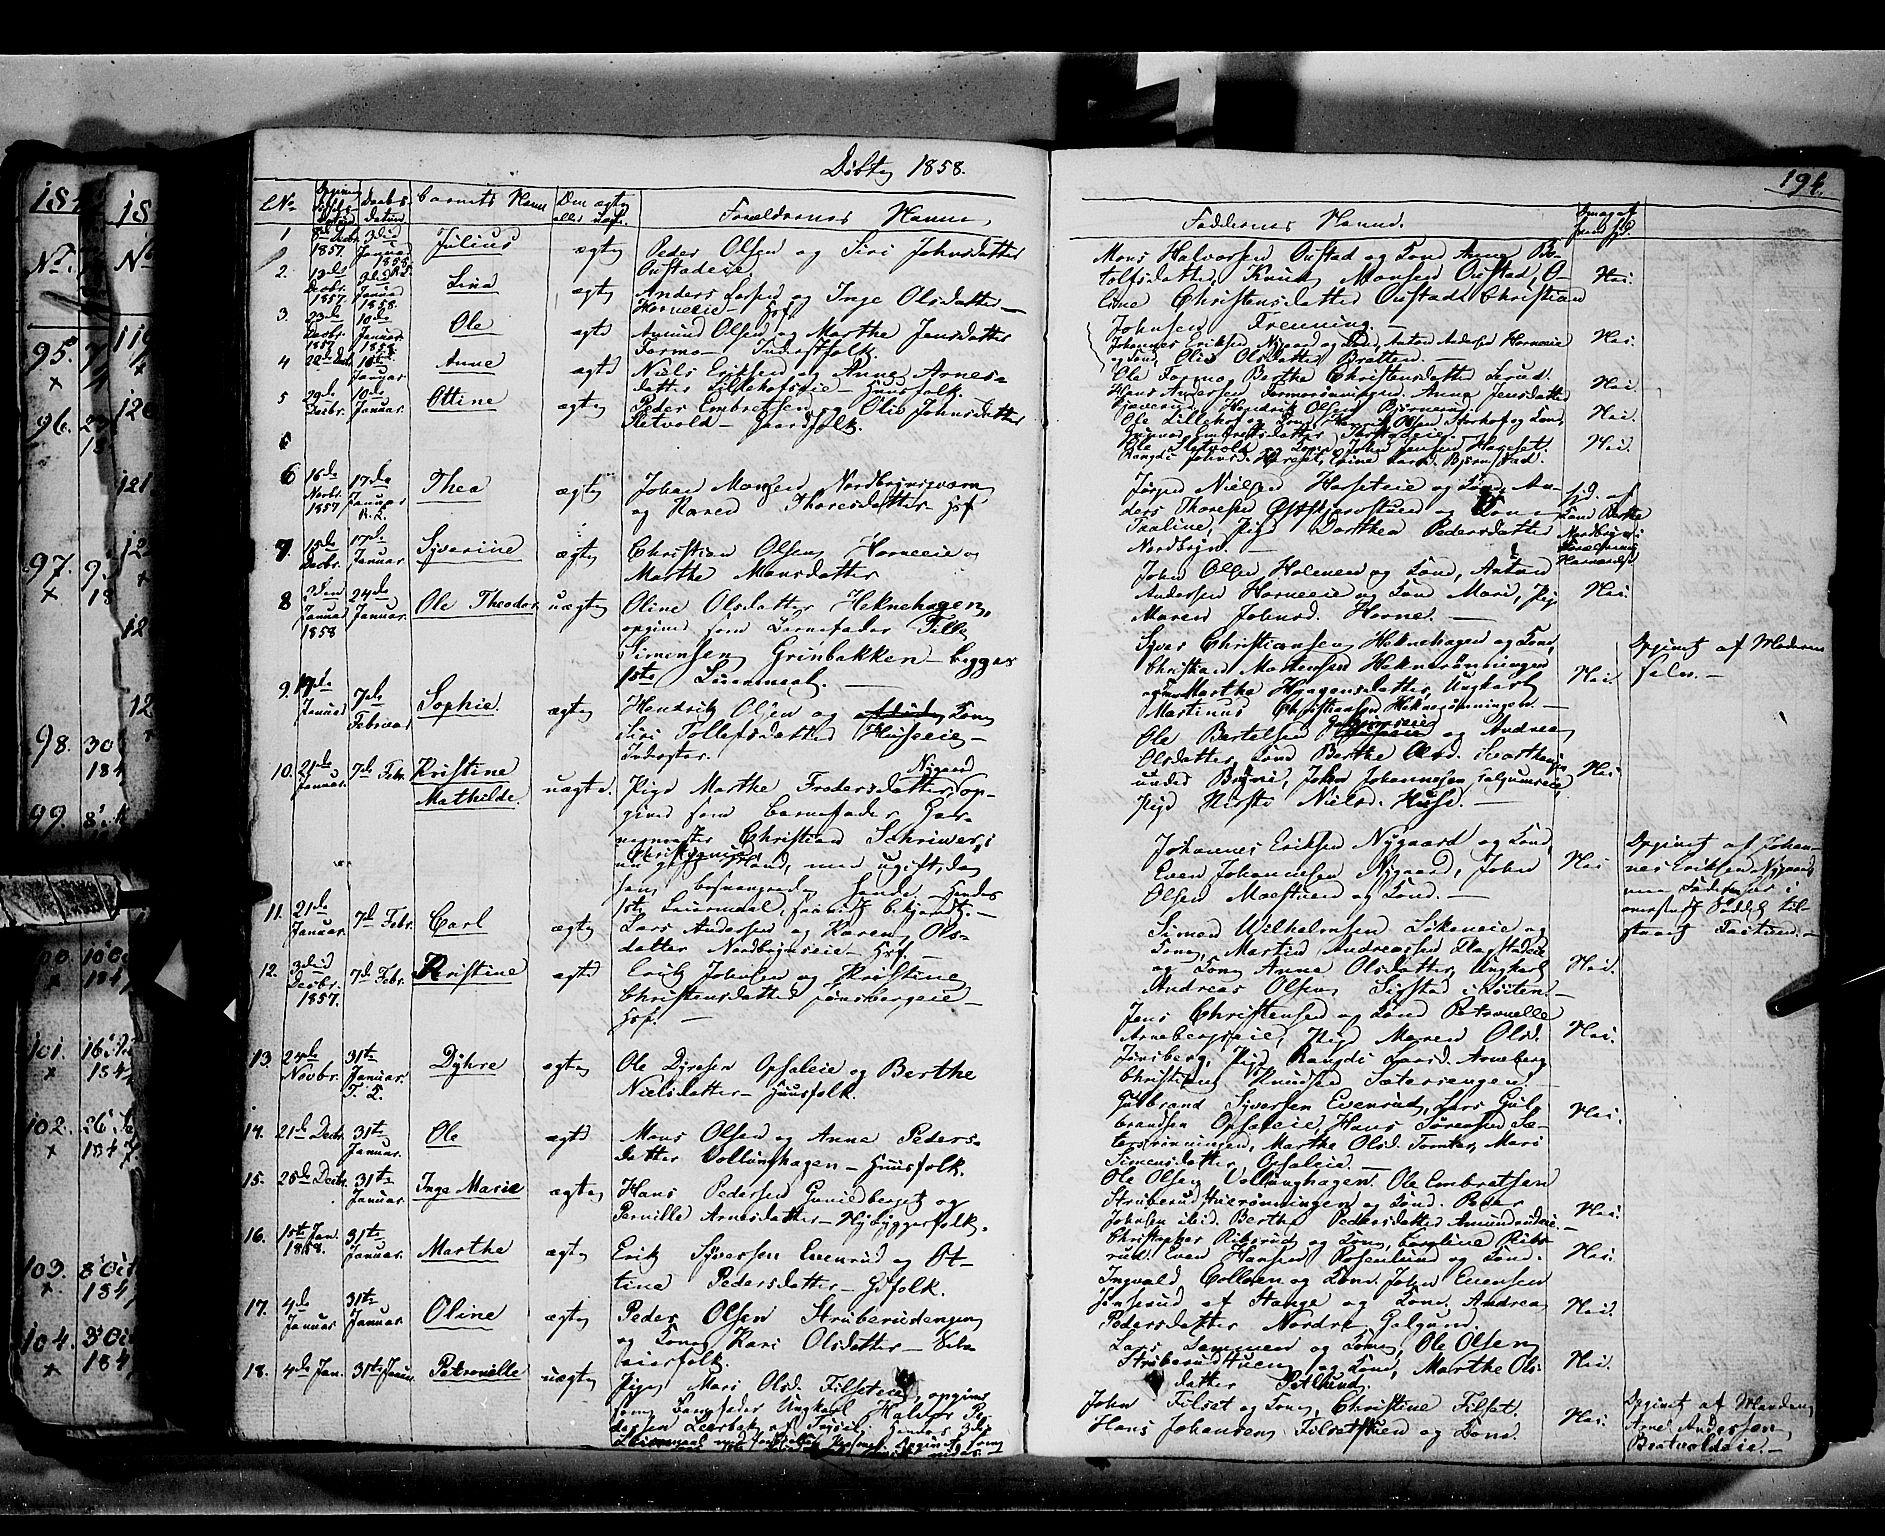 SAH, Romedal prestekontor, K/L0004: Ministerialbok nr. 4, 1847-1861, s. 194